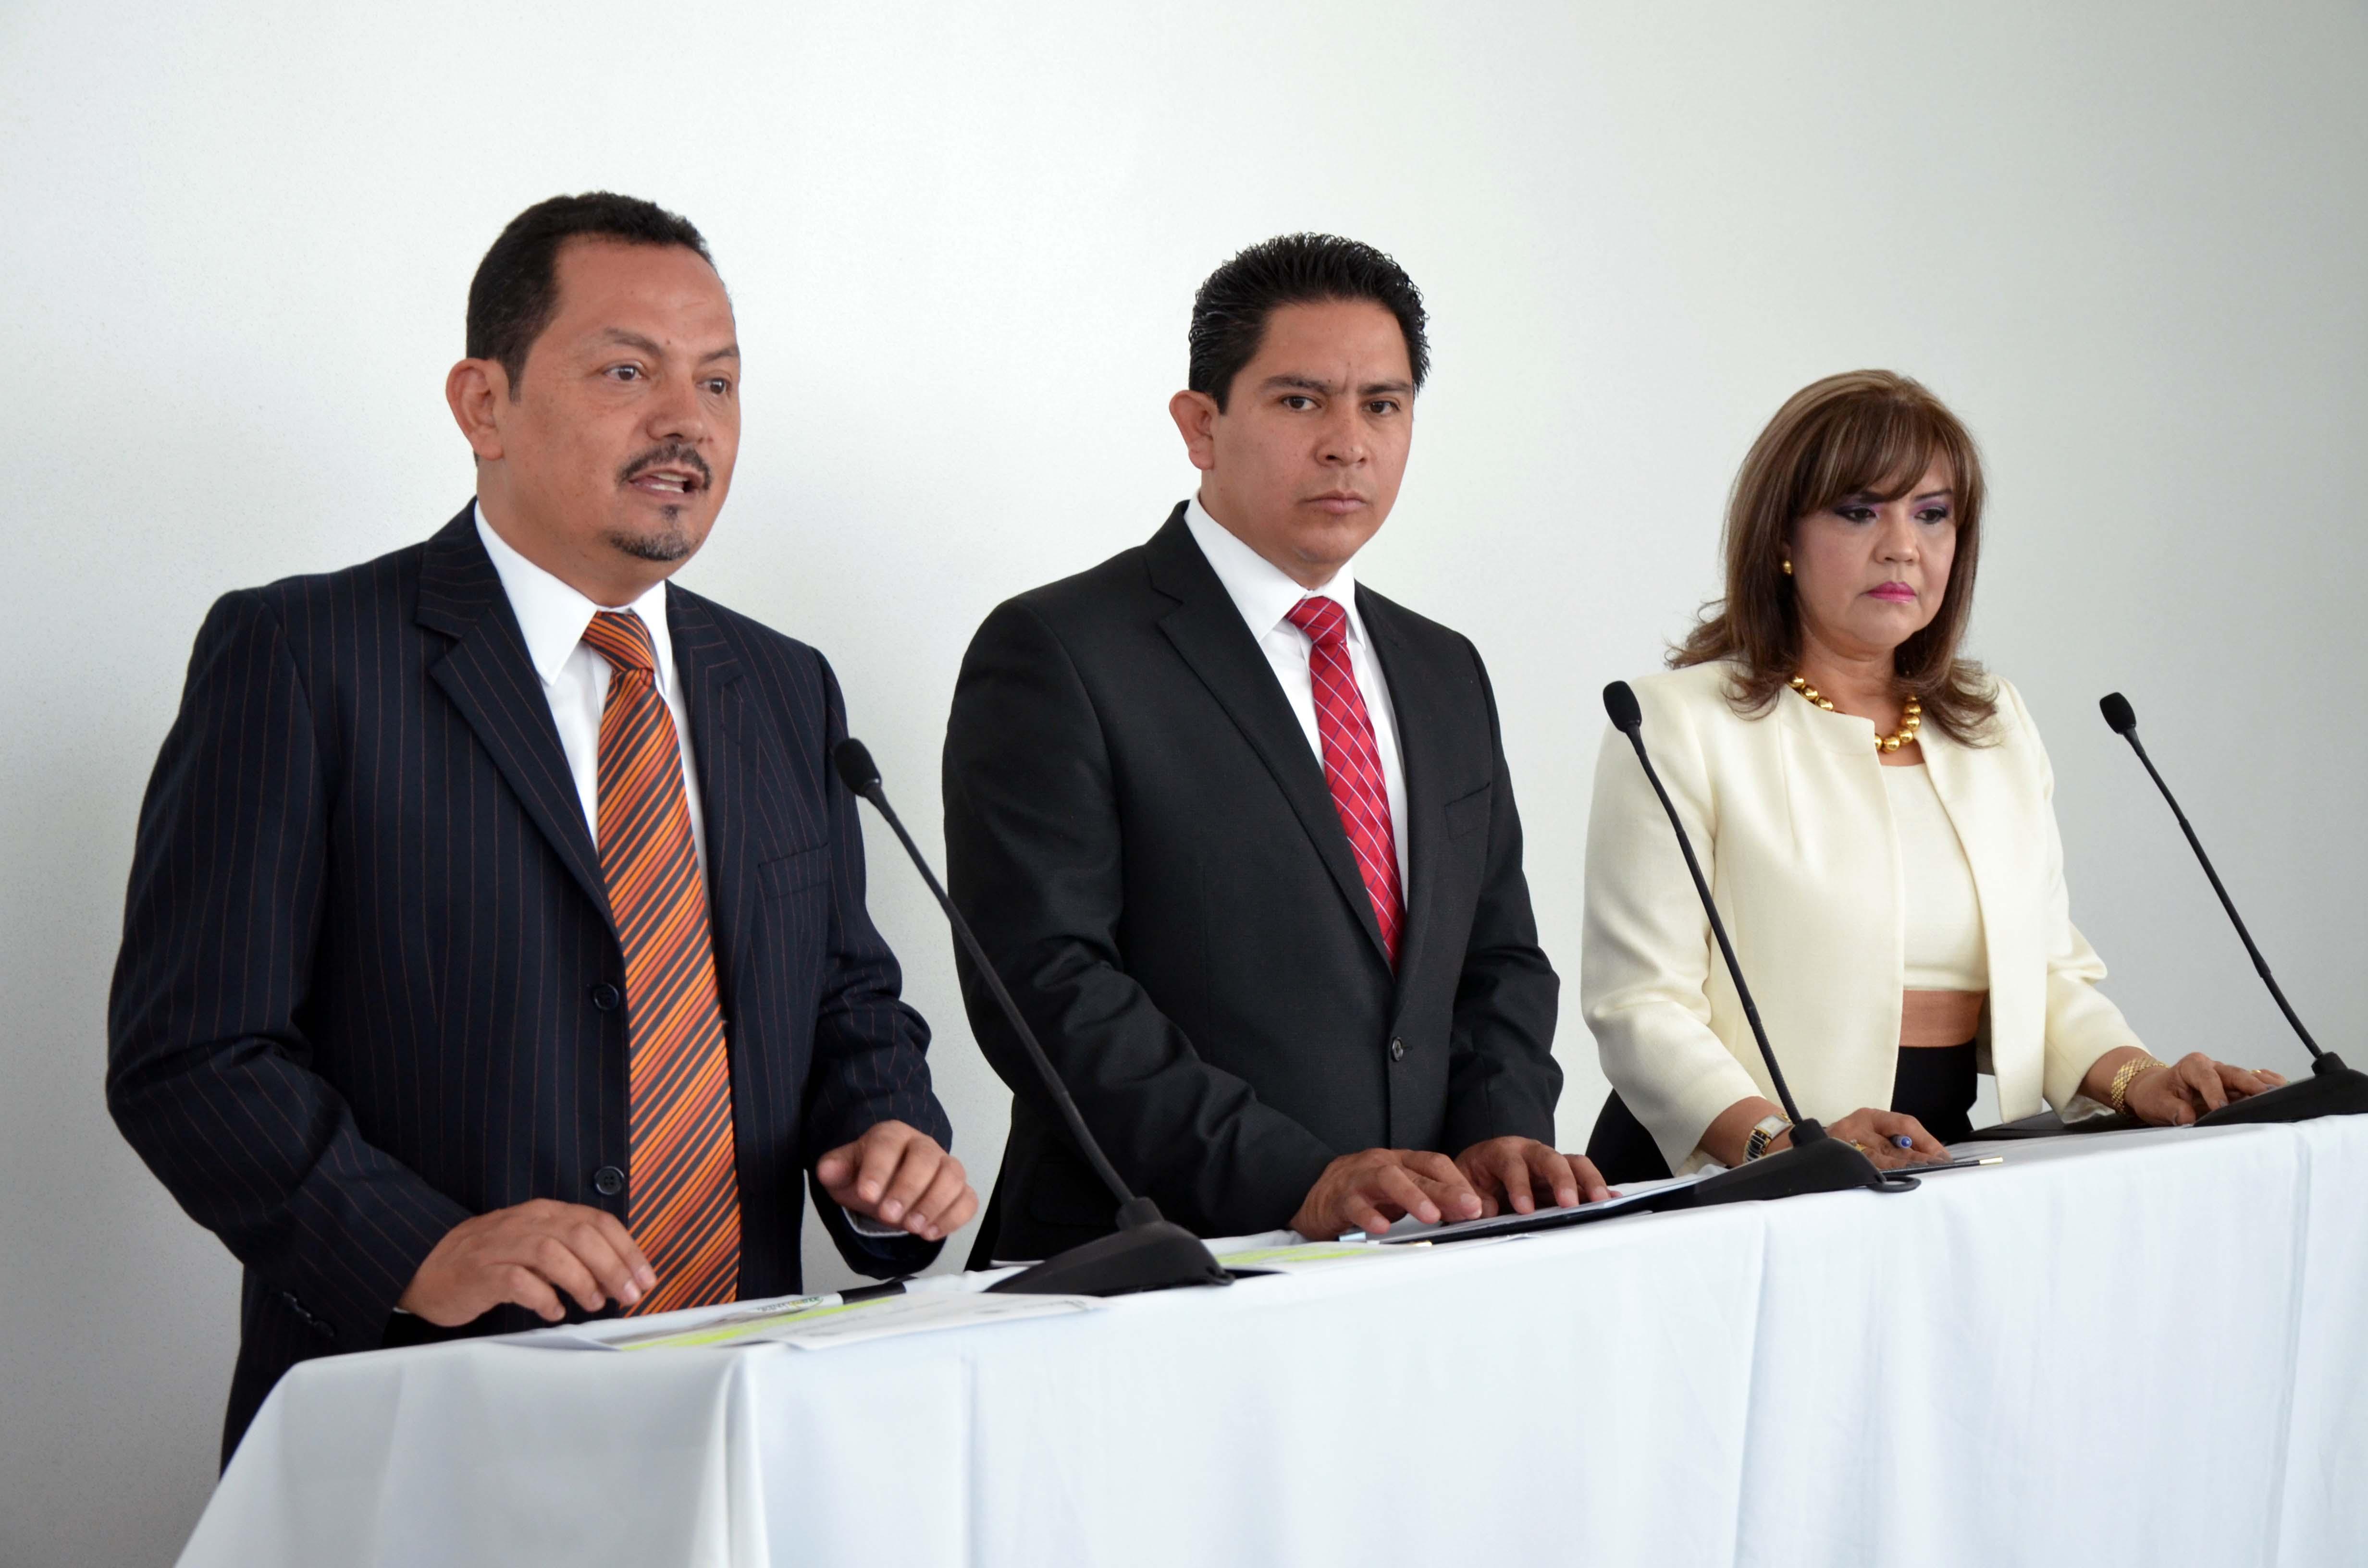 20140809 Firma de Convenio Servicios IMSS ISSSTE Salud 03jpg